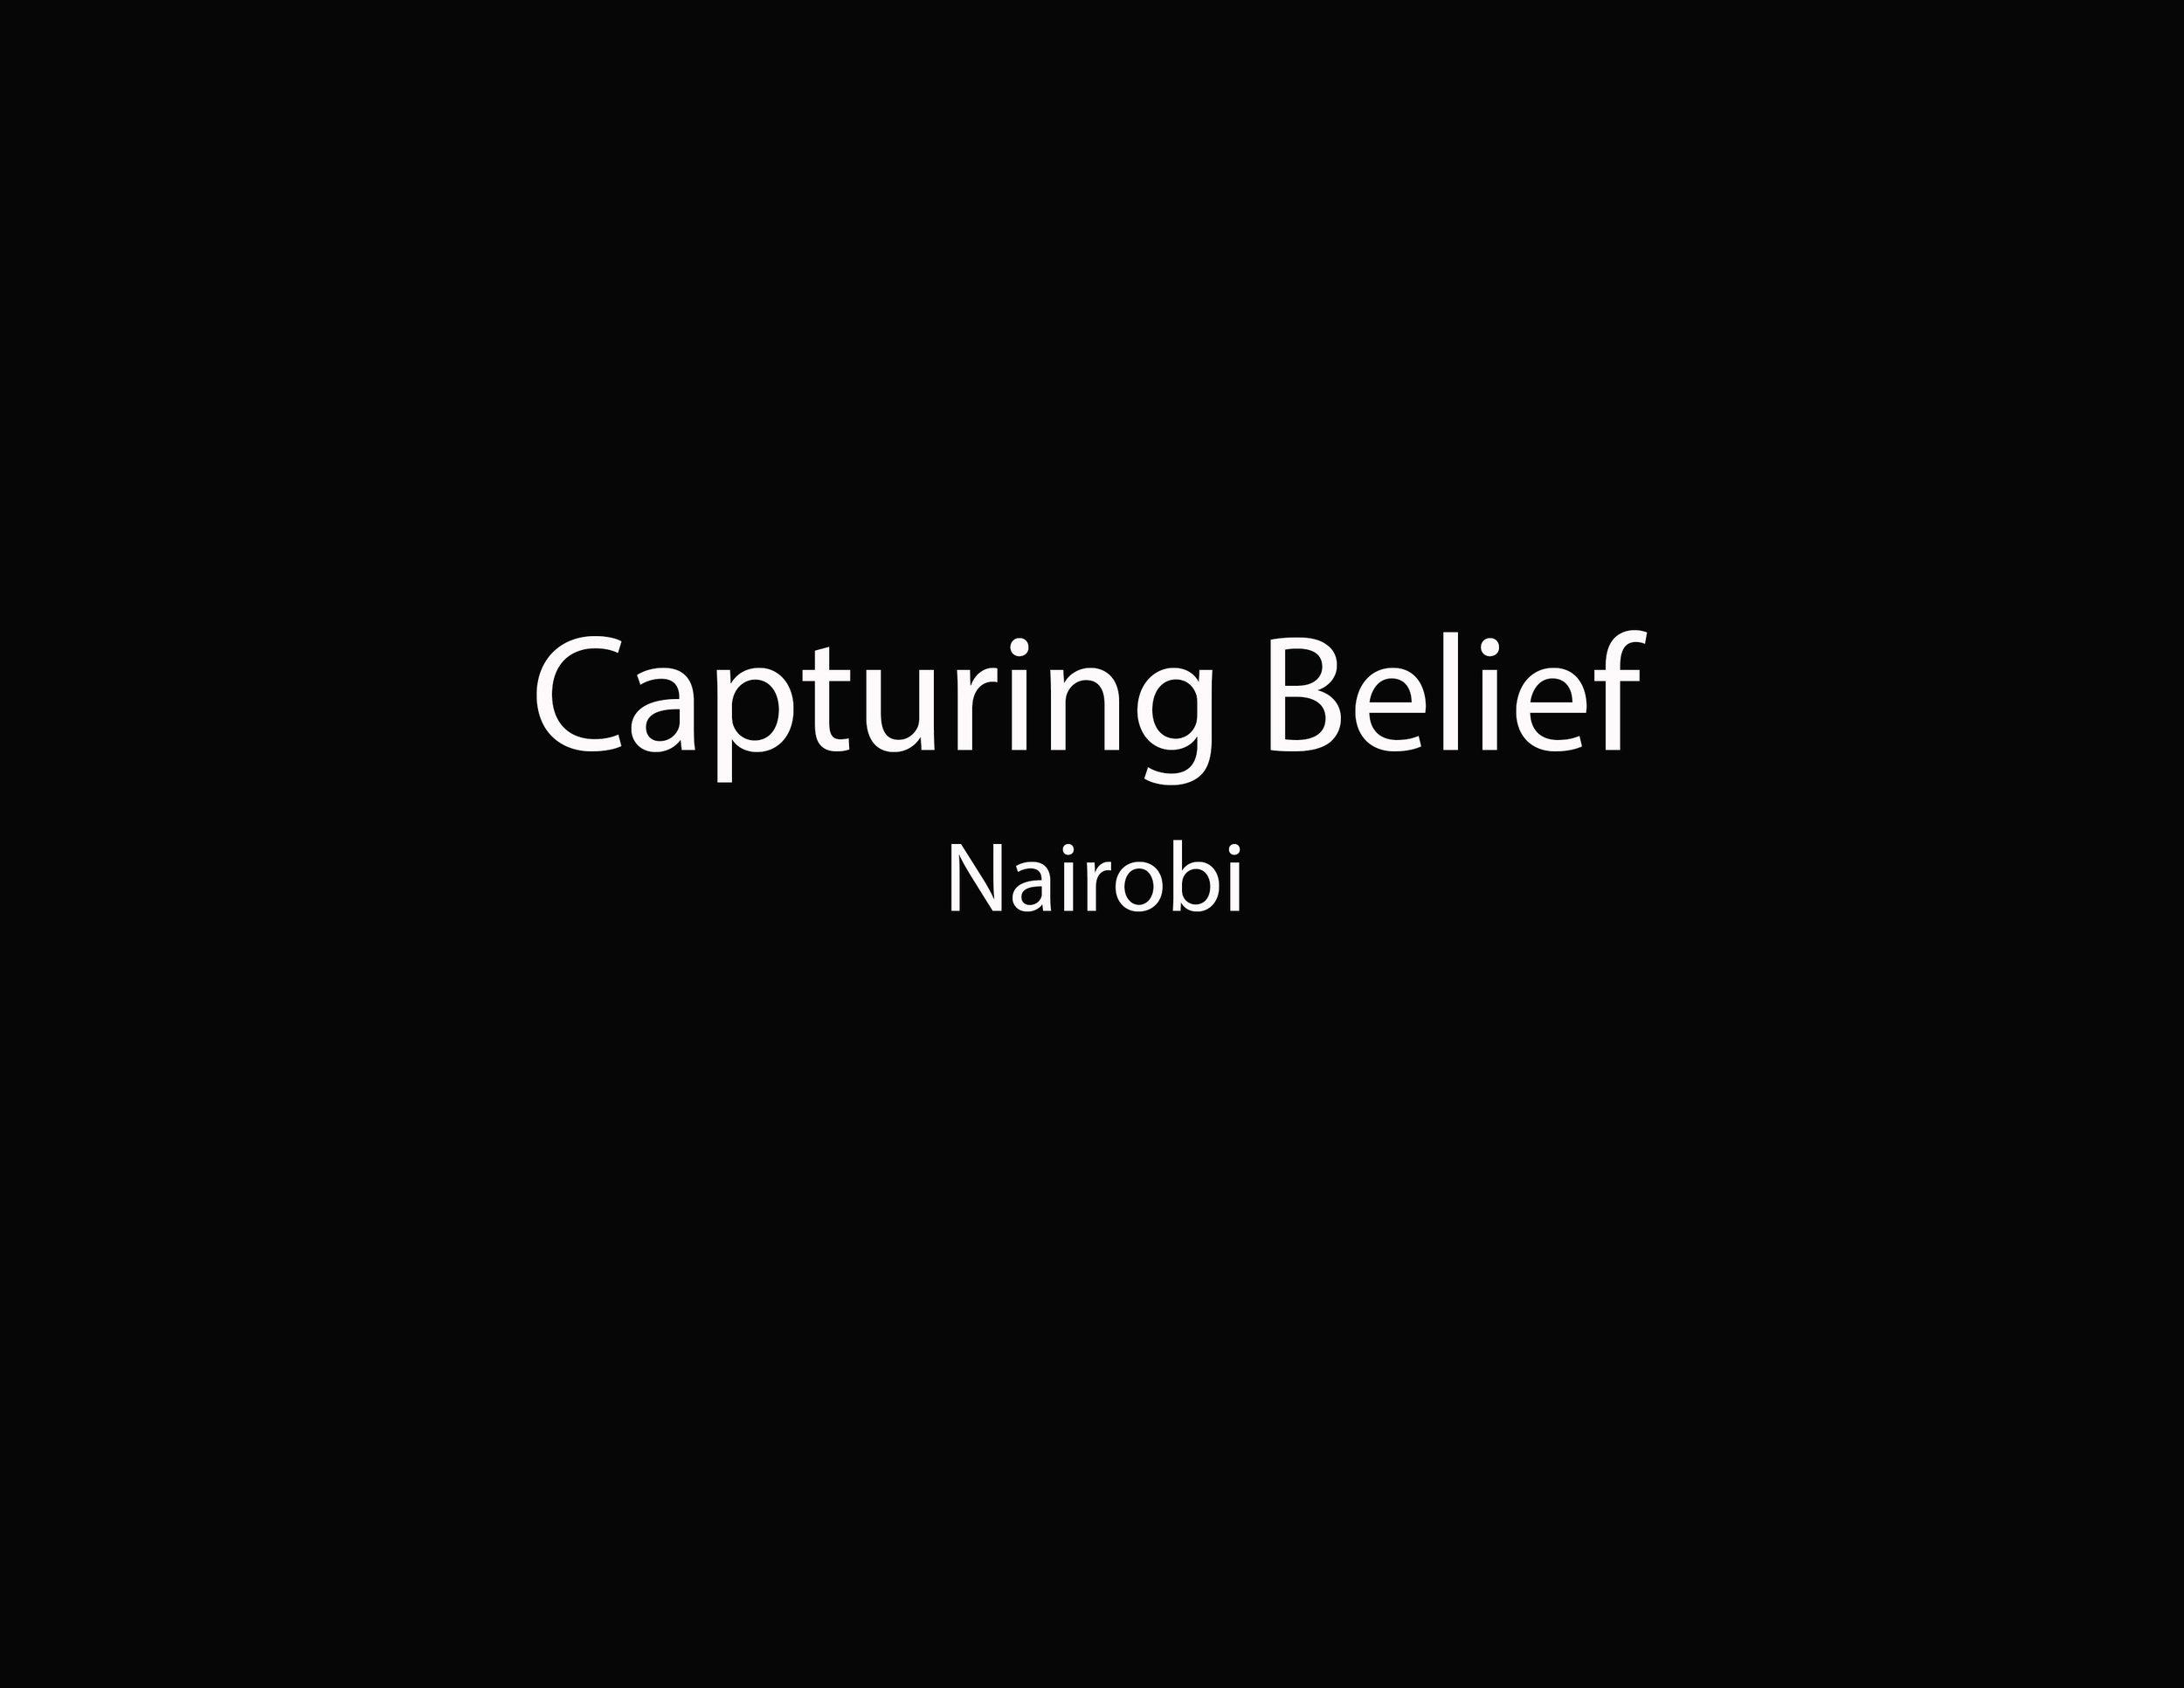 Nairobi_0001.JPG